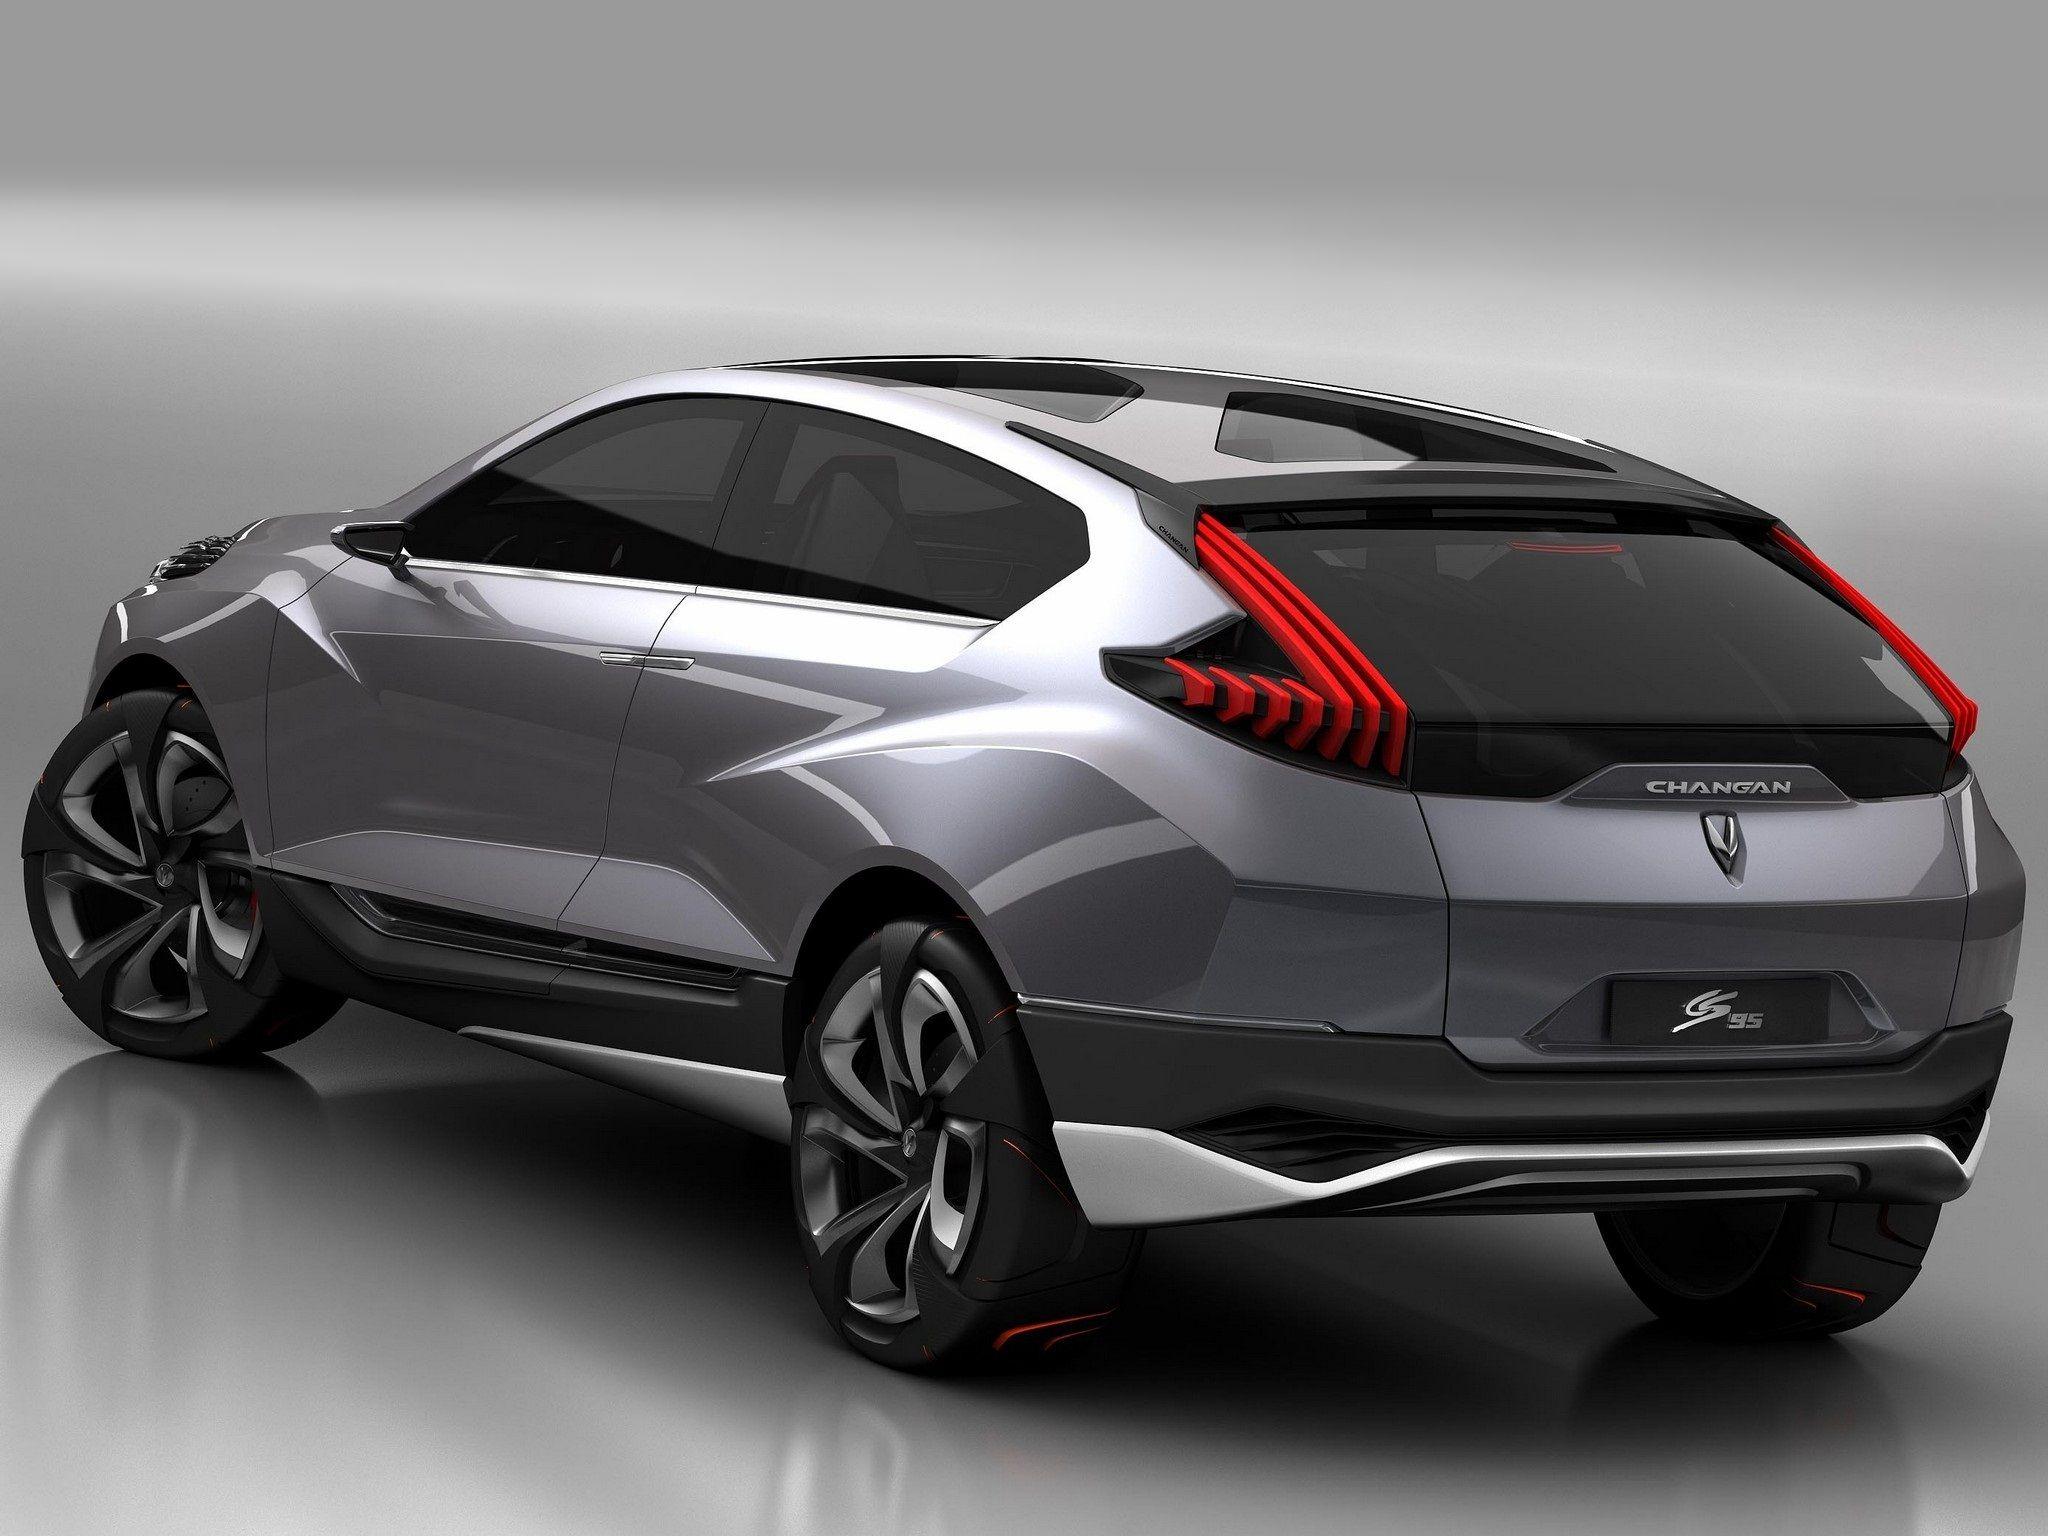 Changan Cs95 With Images Chang An Car Design Cool Cars